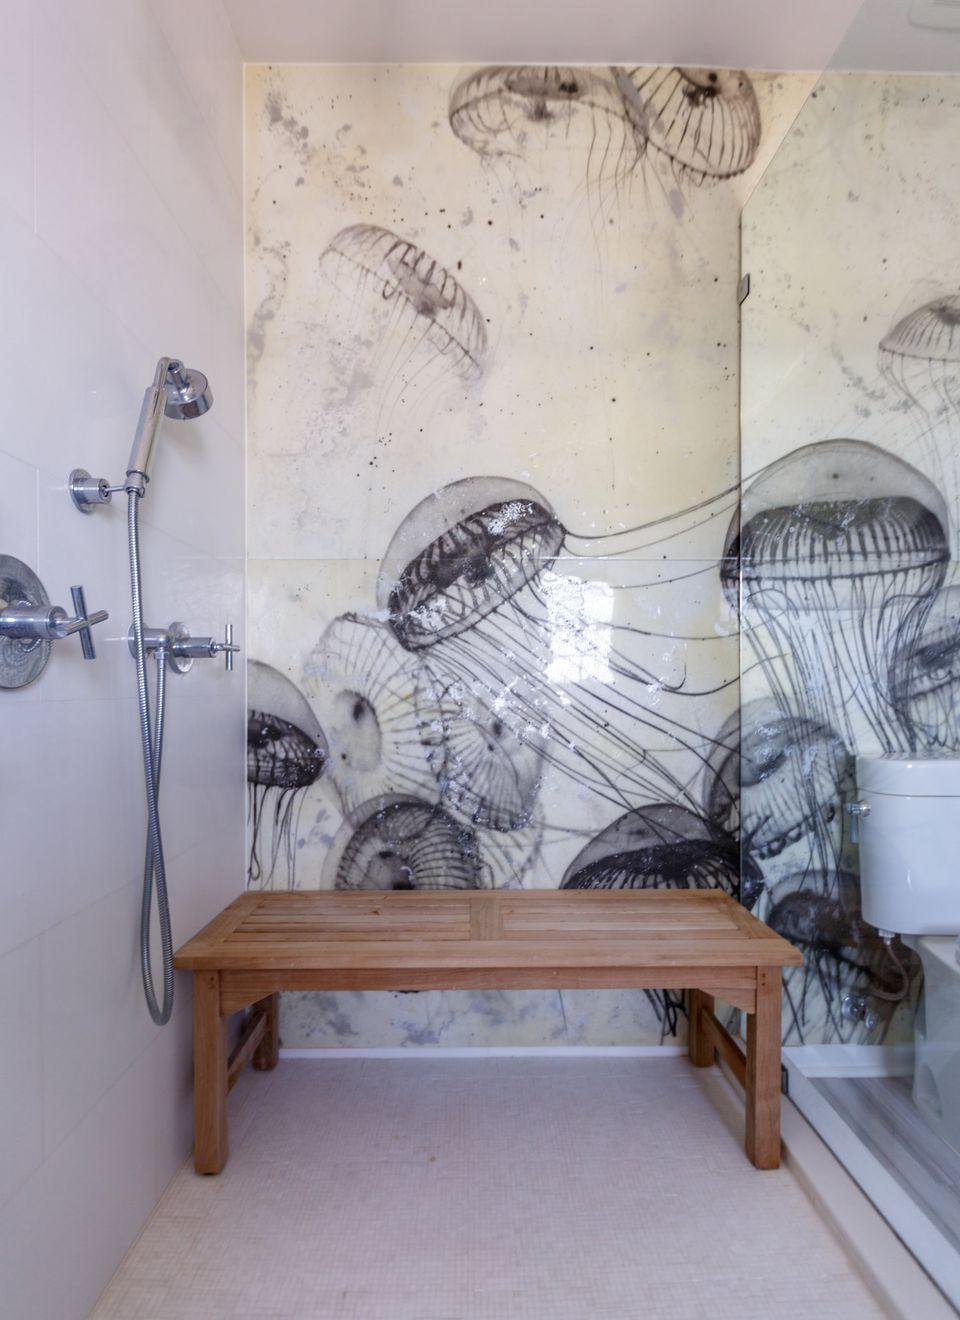 Jellyfish Wall Tile